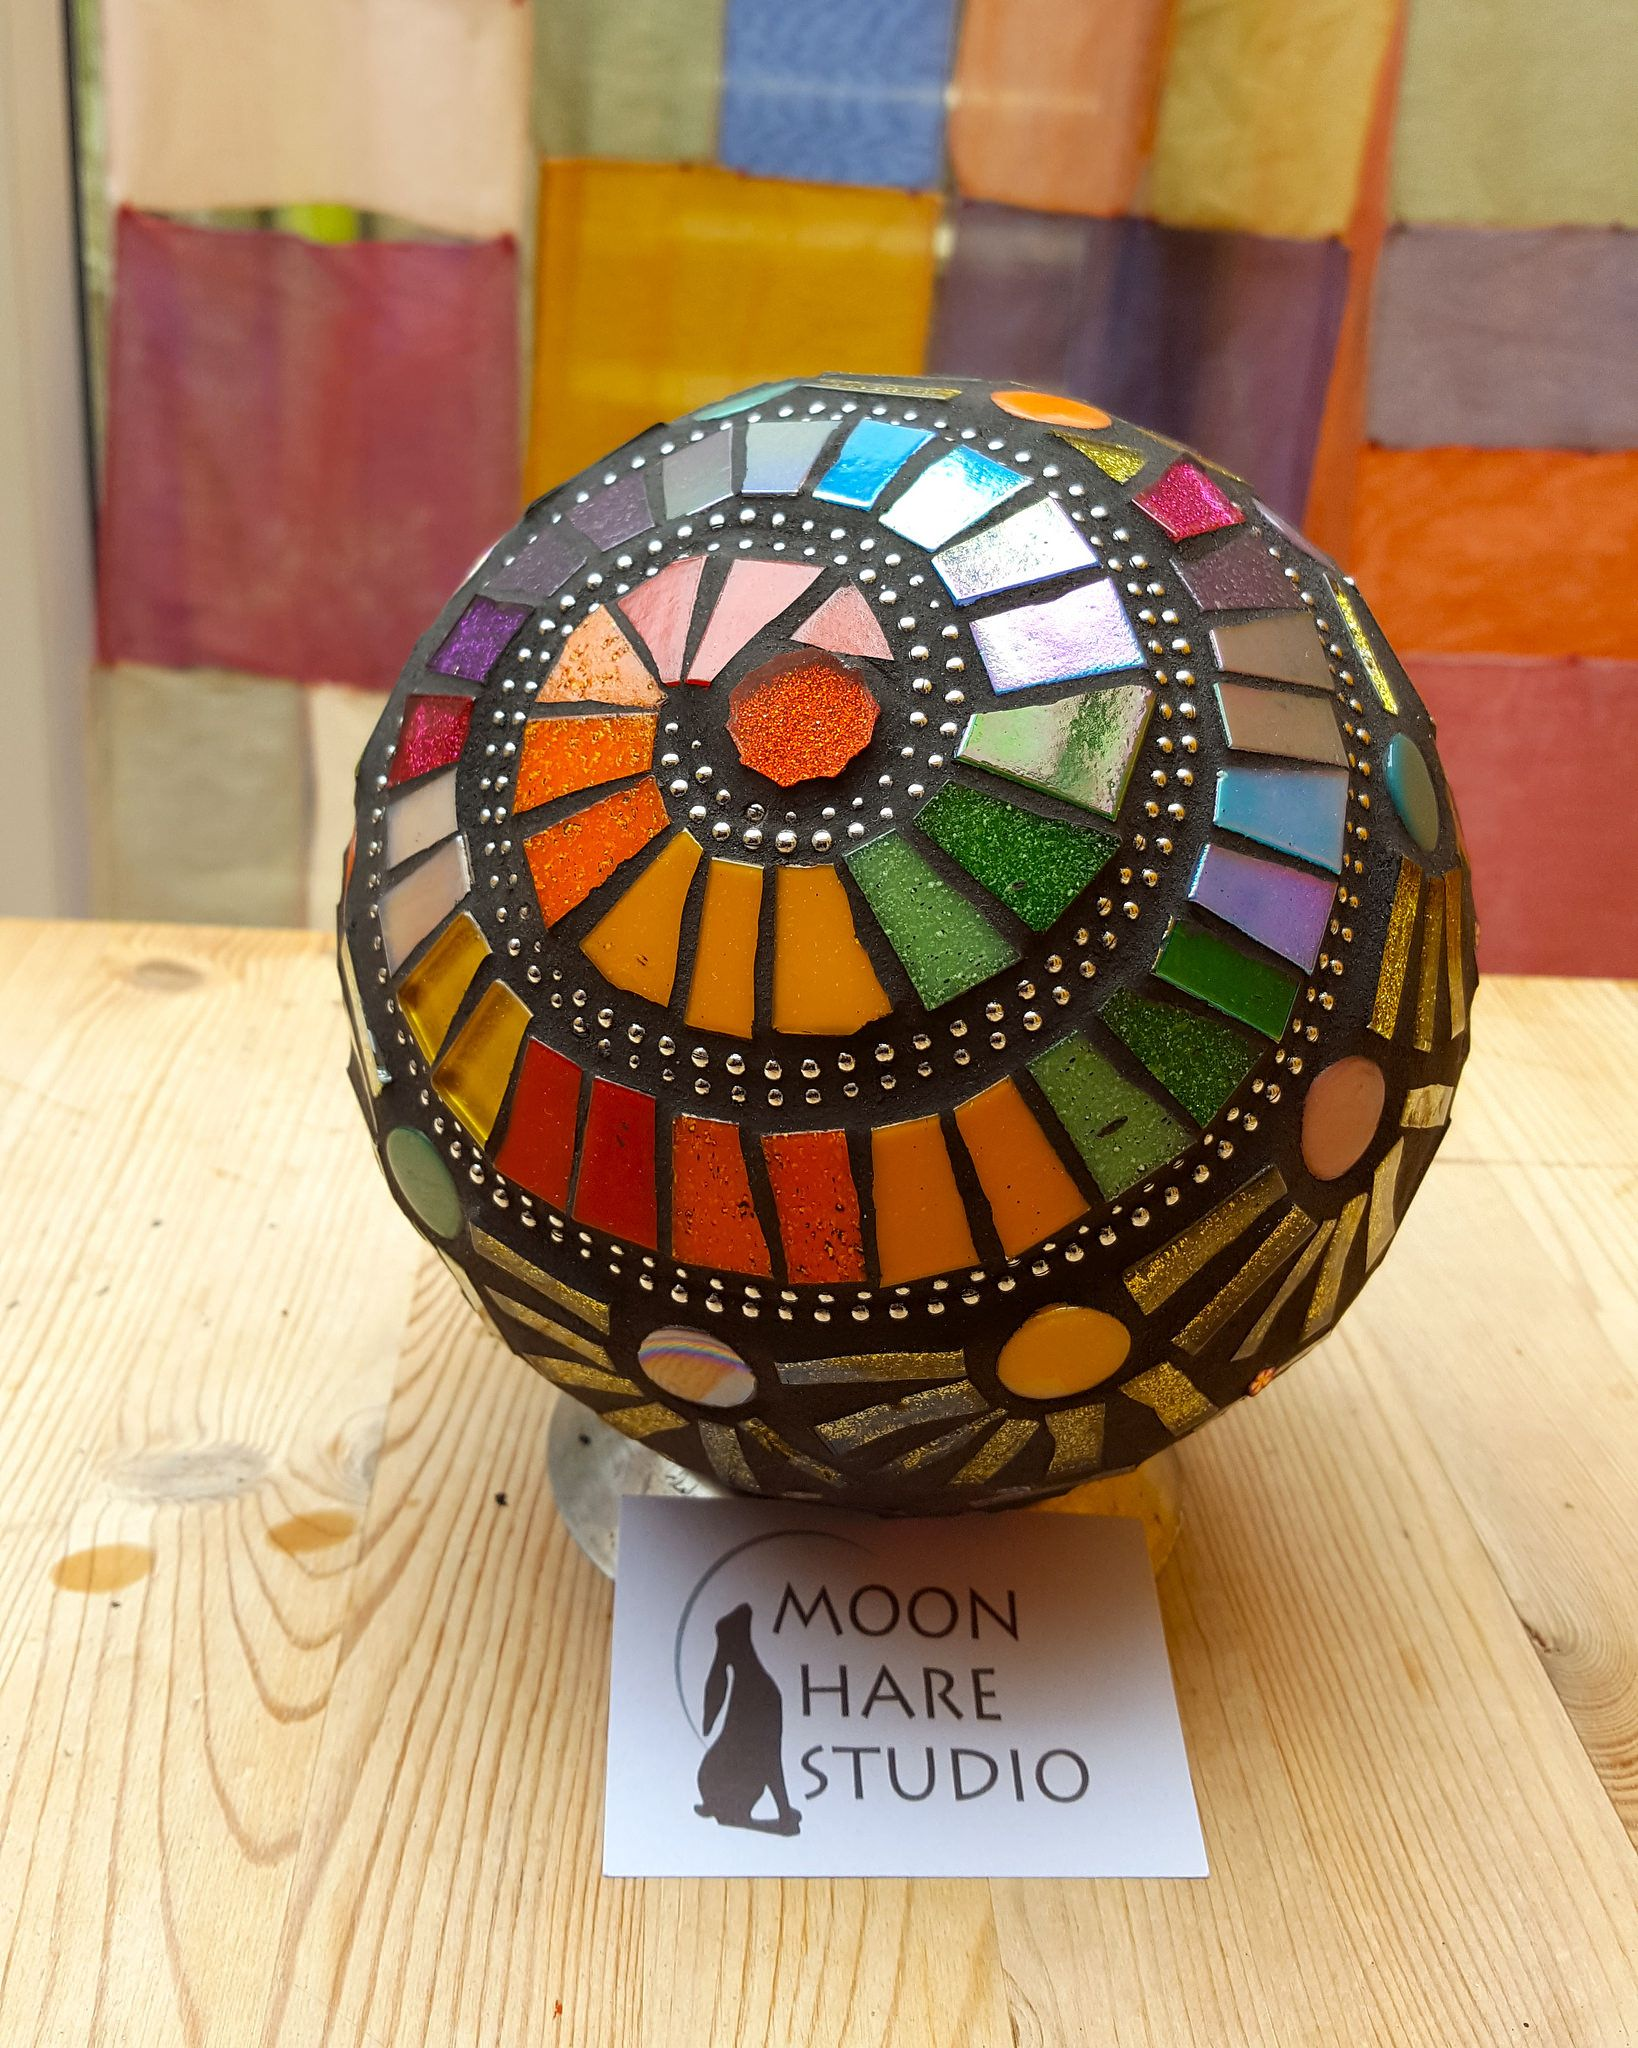 Moon Hare Studio Adela Webb Garden Gazing Ball Mosaic Spheres & Bowling Balls